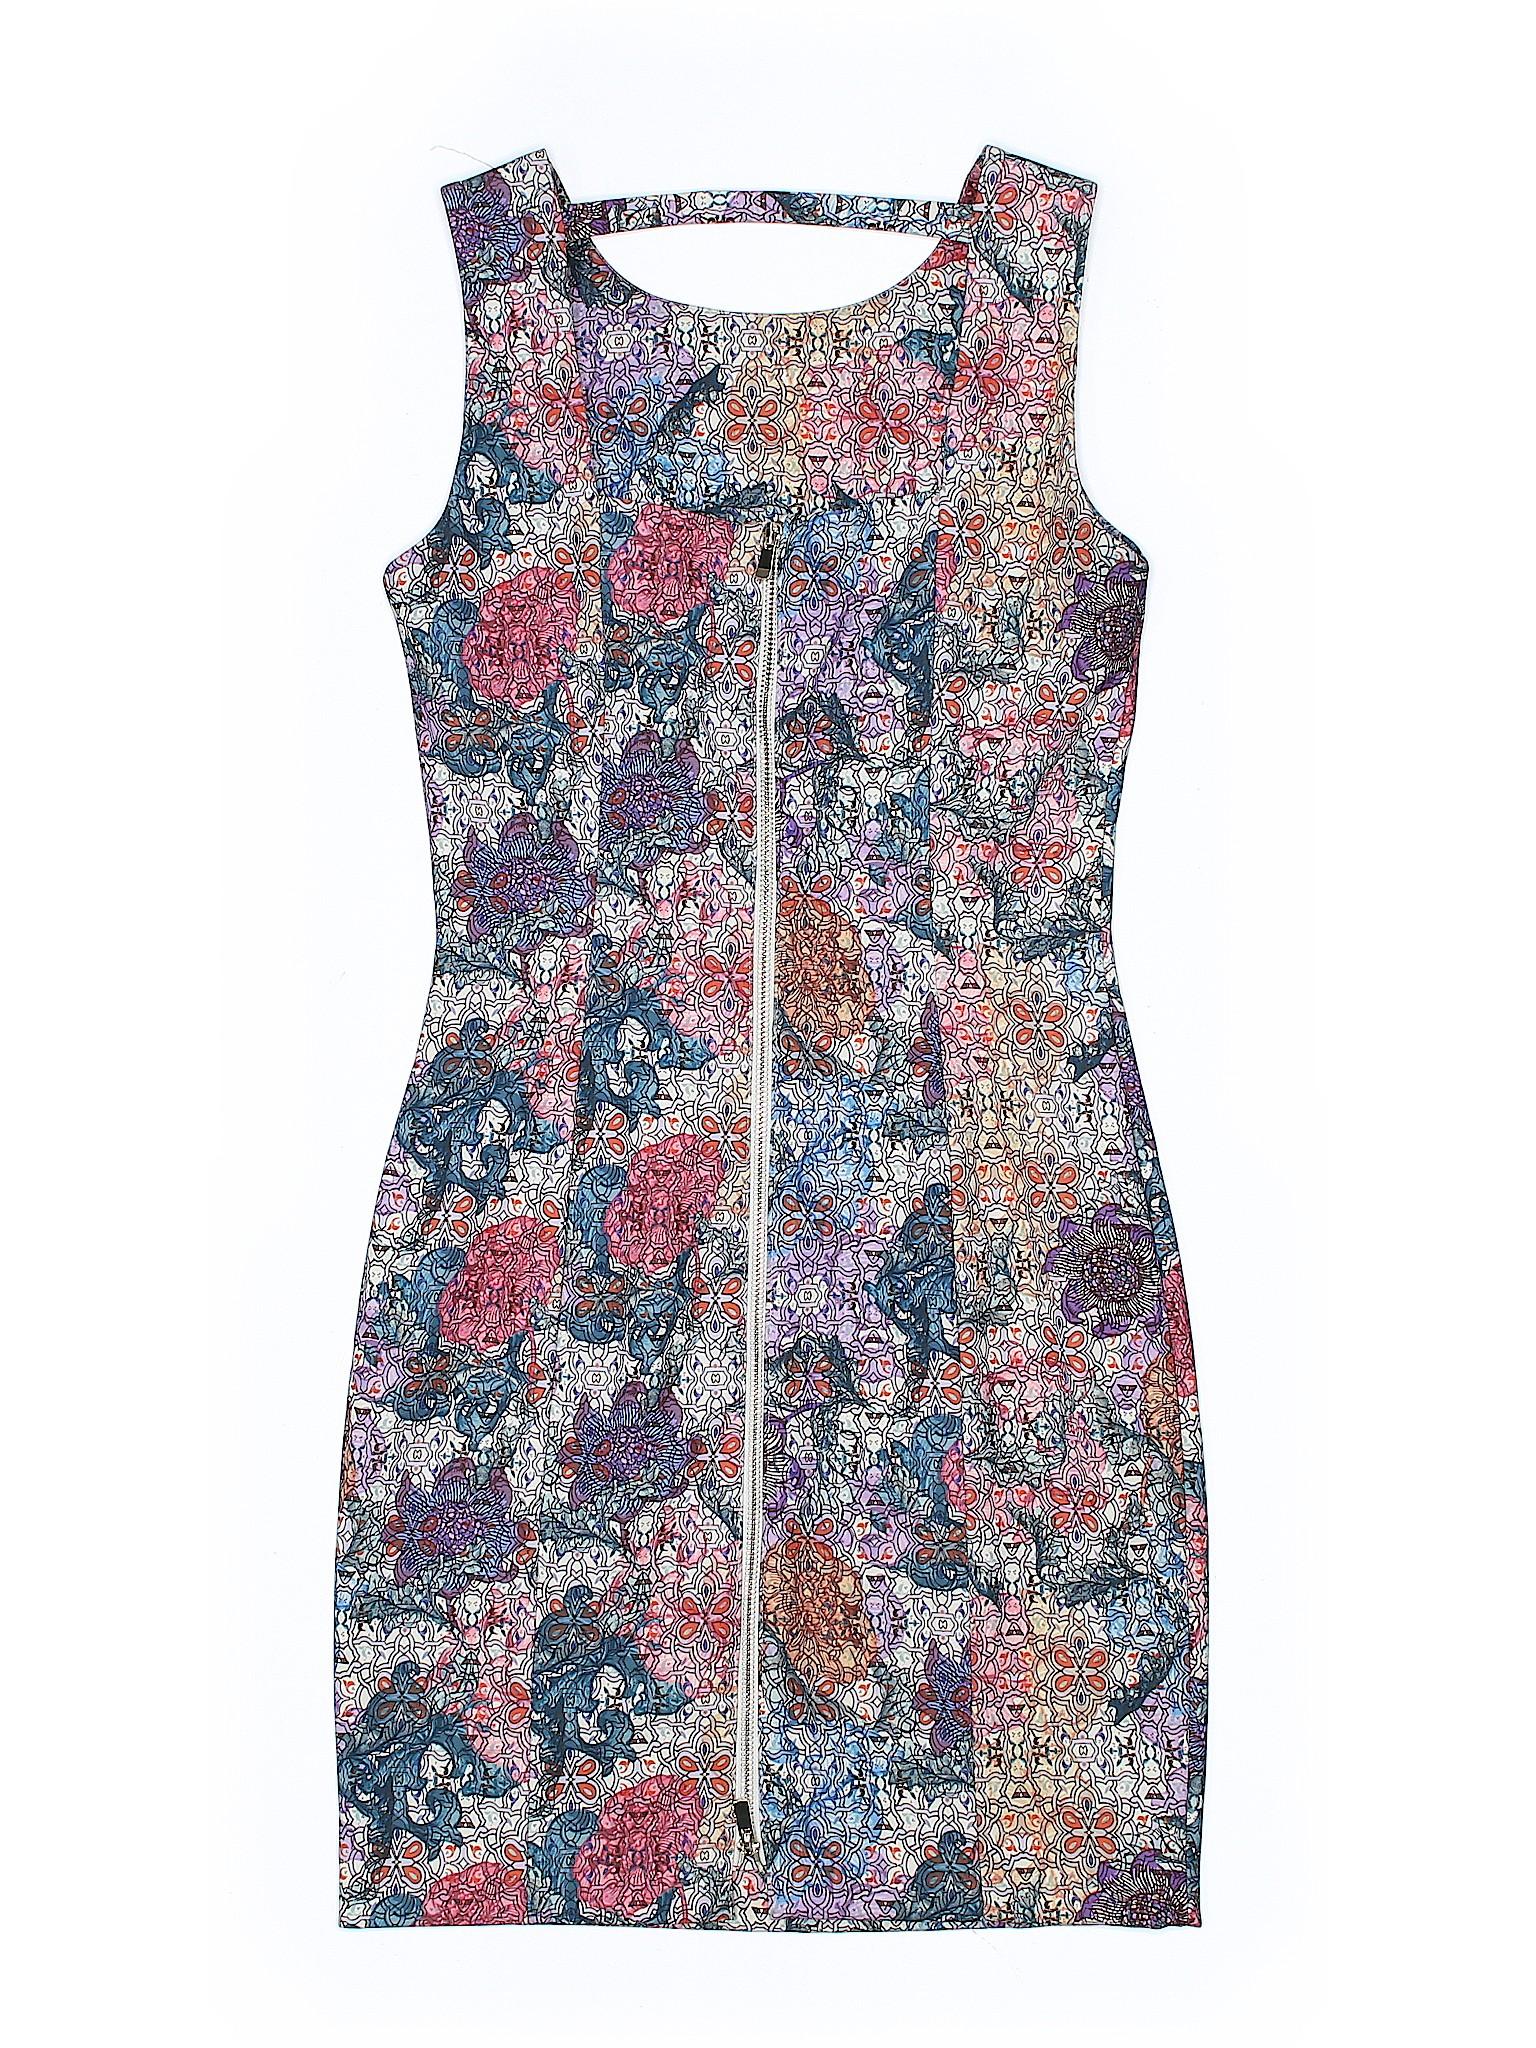 Casual H amp;M Boutique winter Dress avZqPw